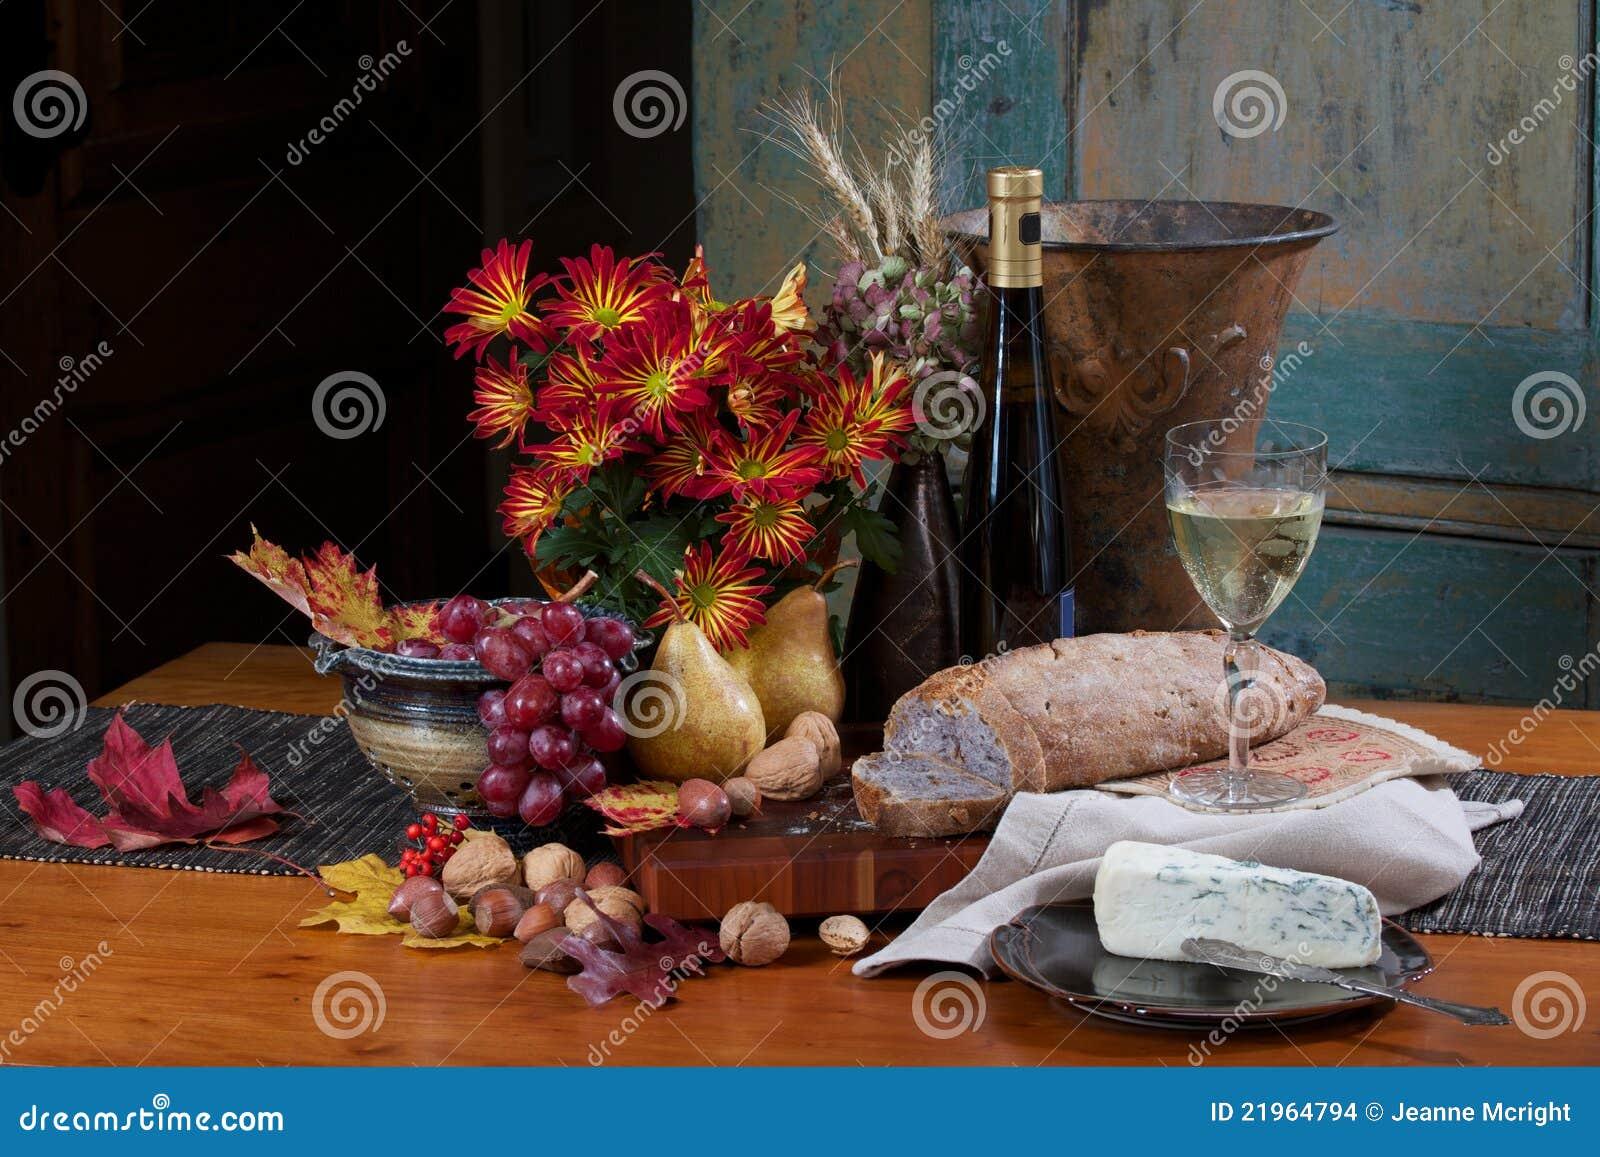 Bread Wine Fruit Cheese Still Life Stock Photo Image